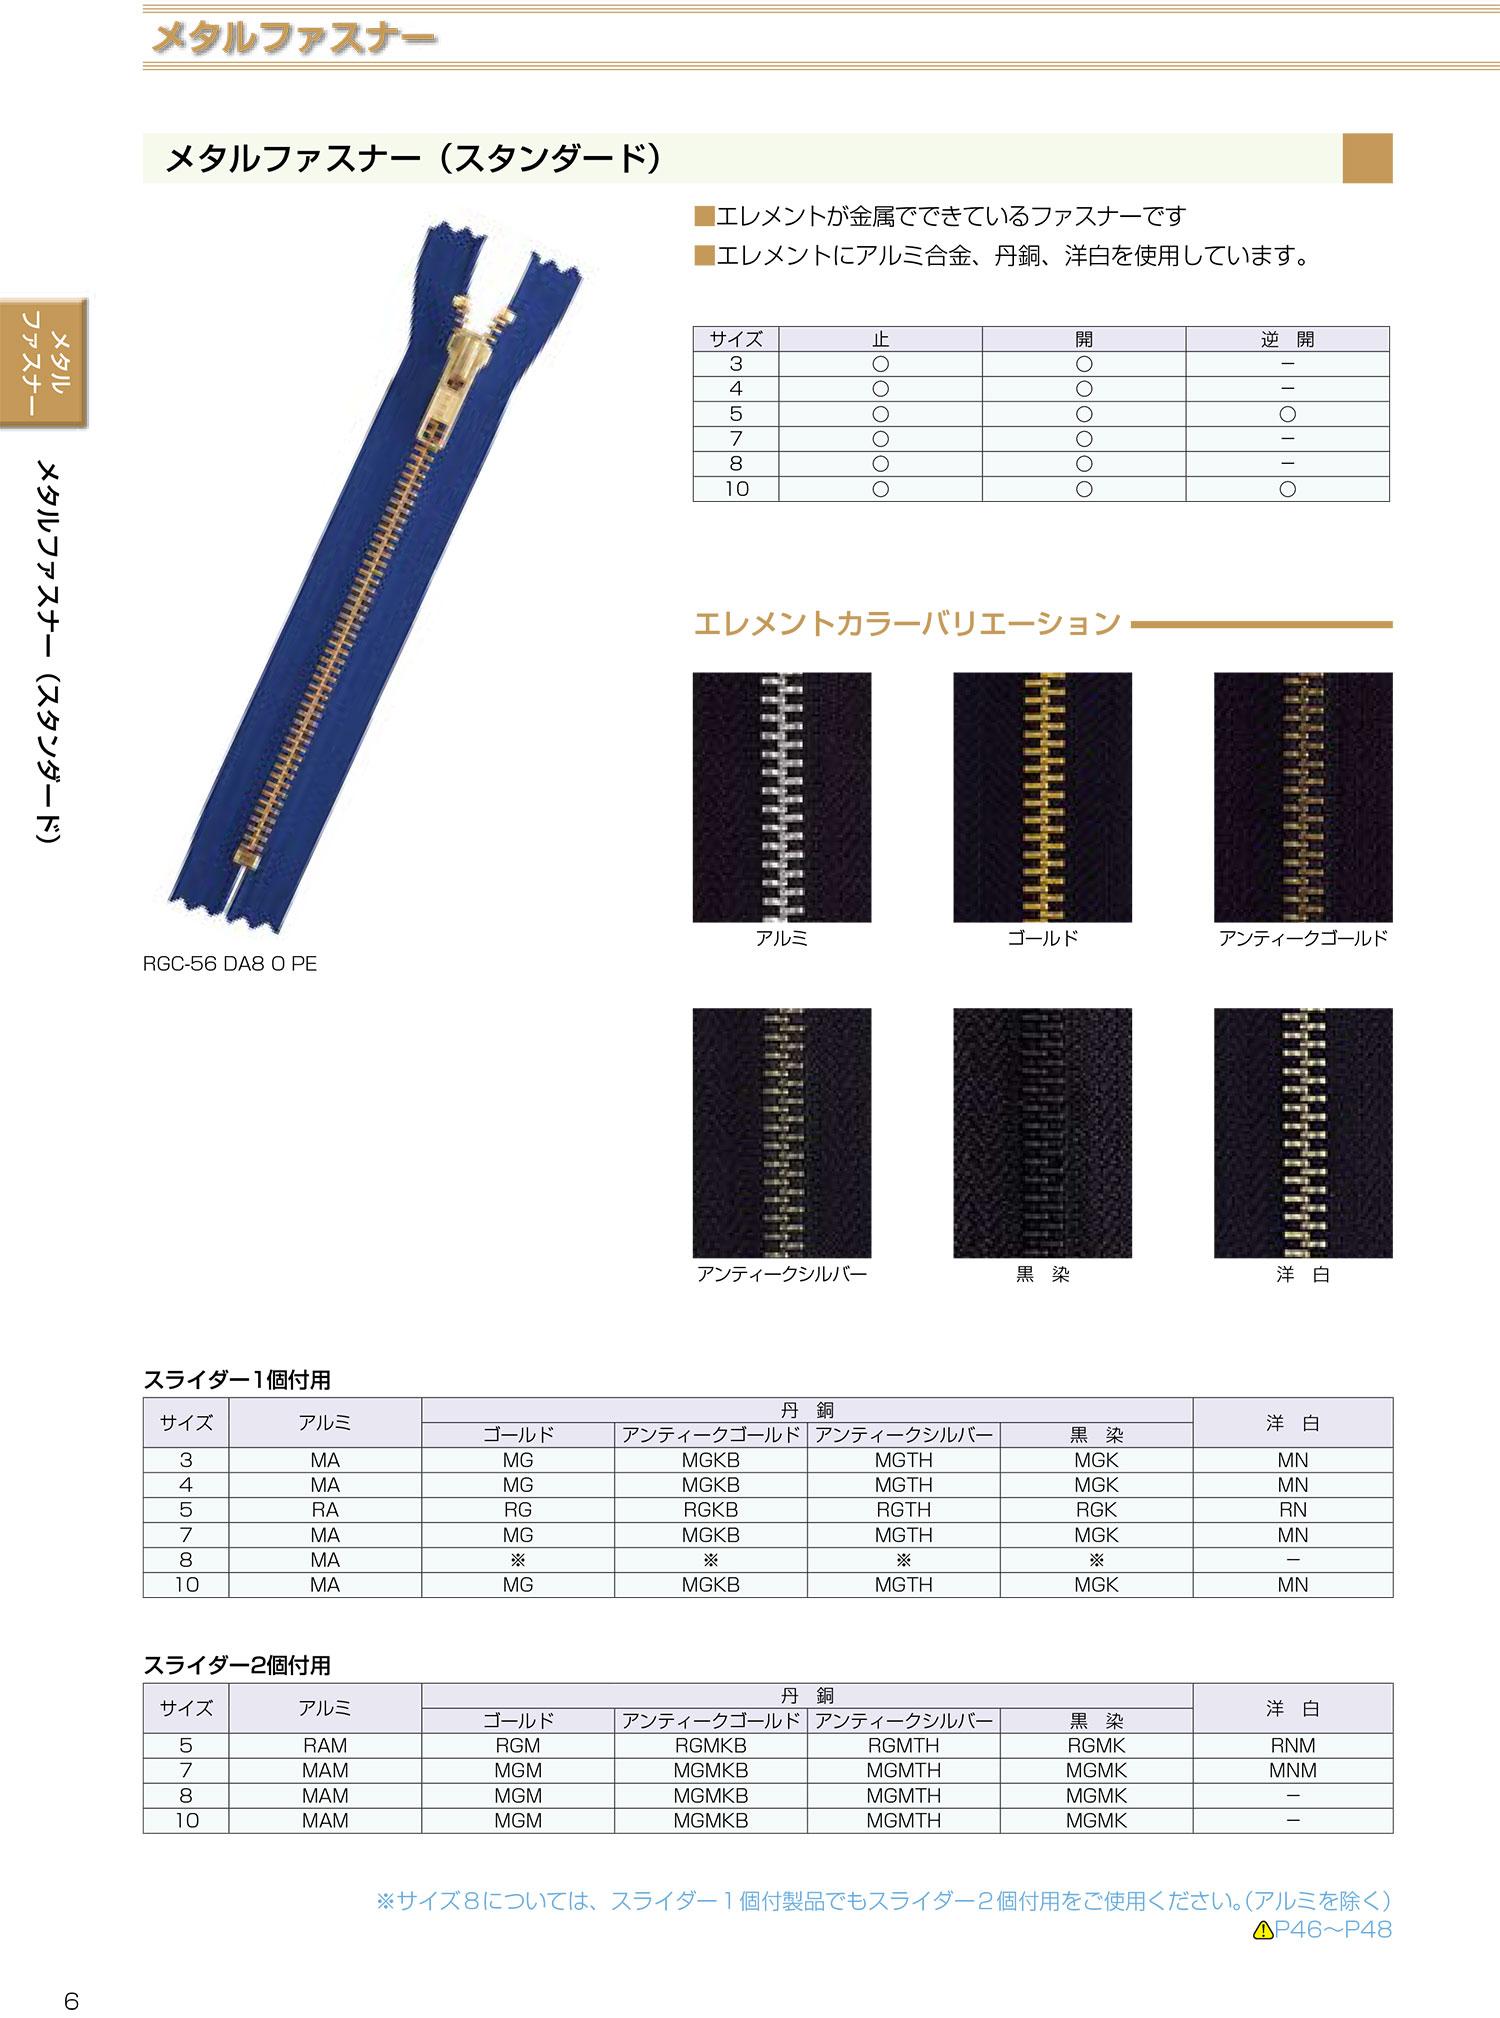 5RGTHC YKKメタルファスナー 5サイズ アンティークシルバー 止め YKK/オークラ商事 - ApparelX アパレル資材卸通販